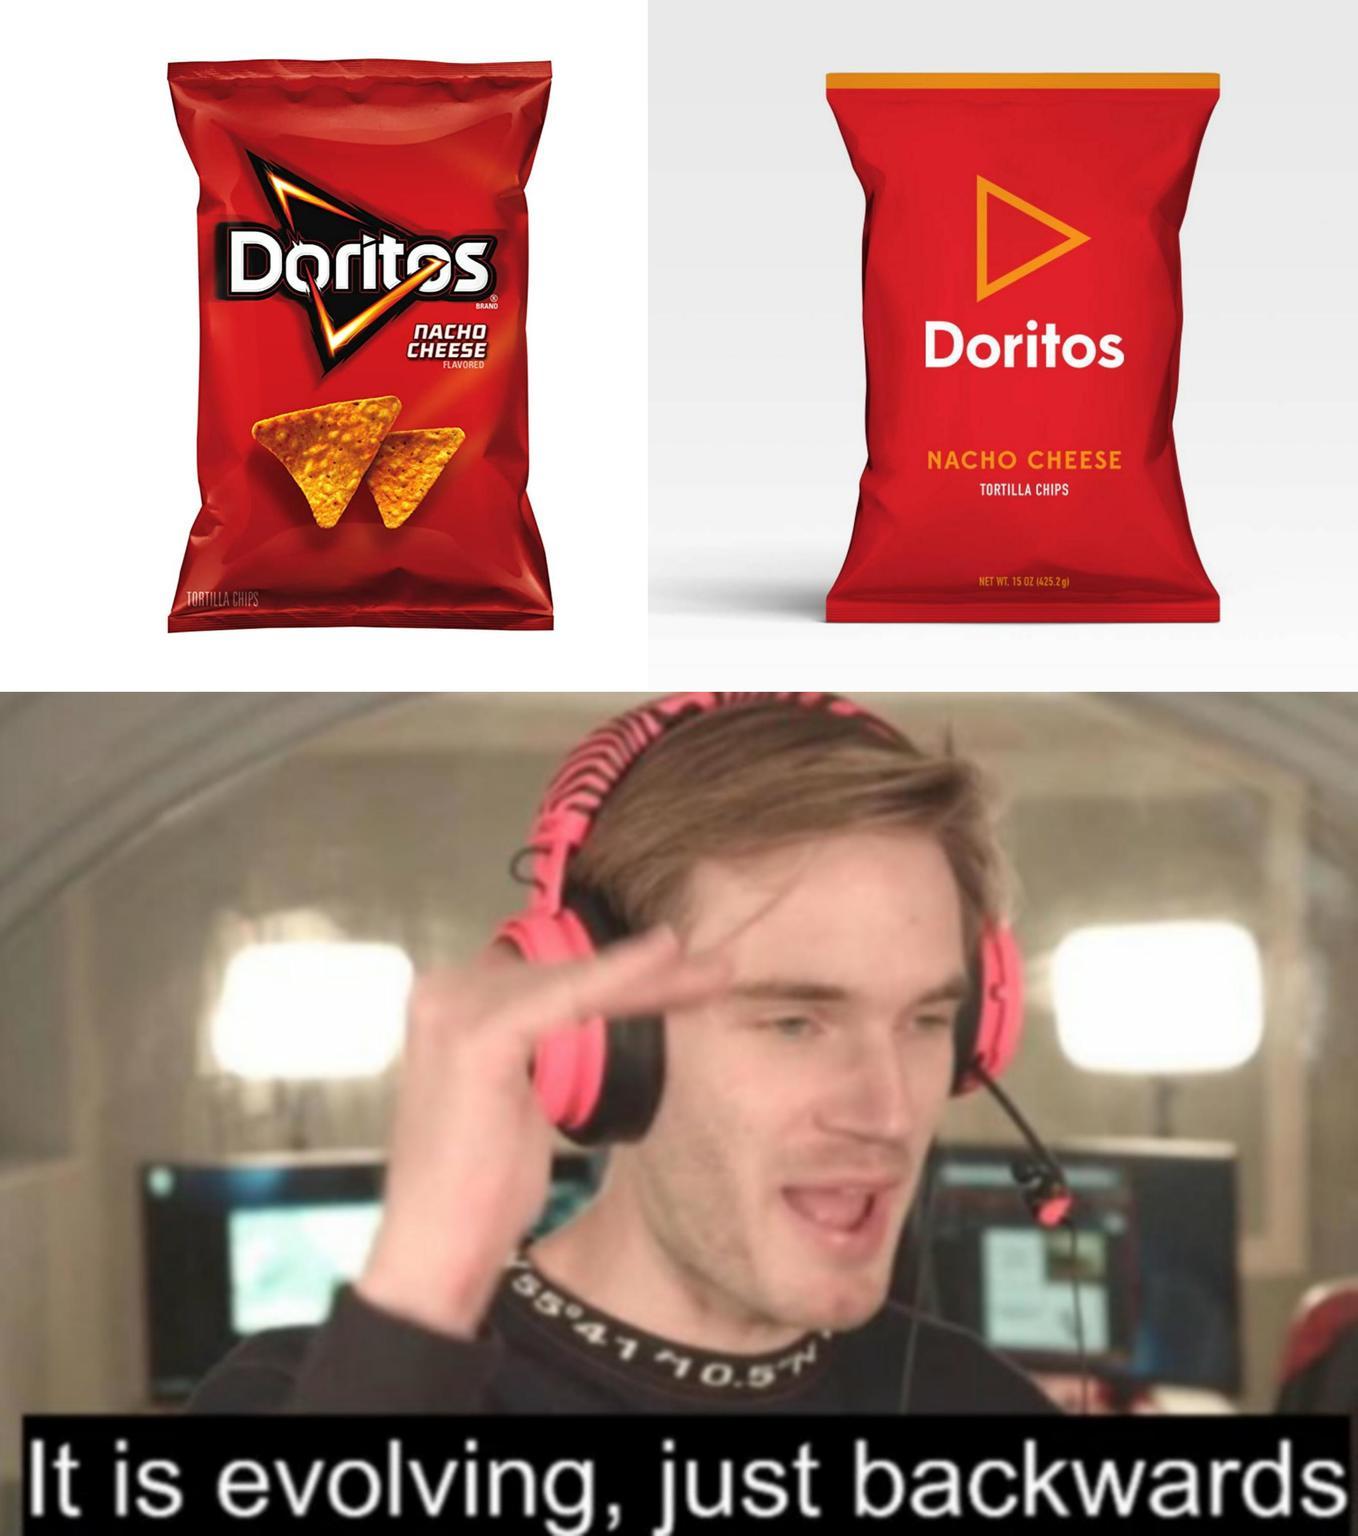 Downgrades people downgrades - meme